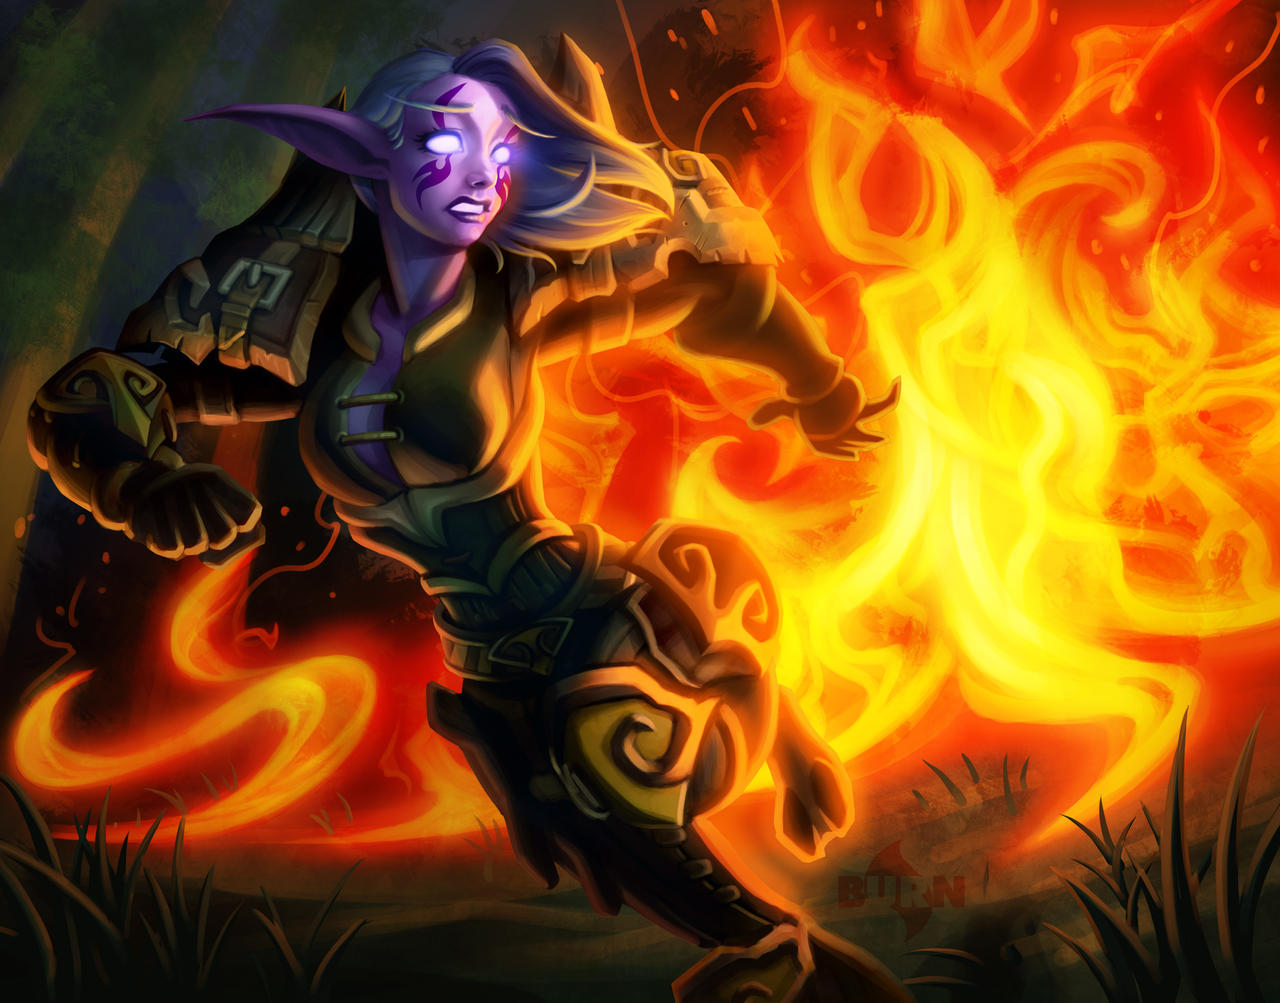 Doomfire by burncomics